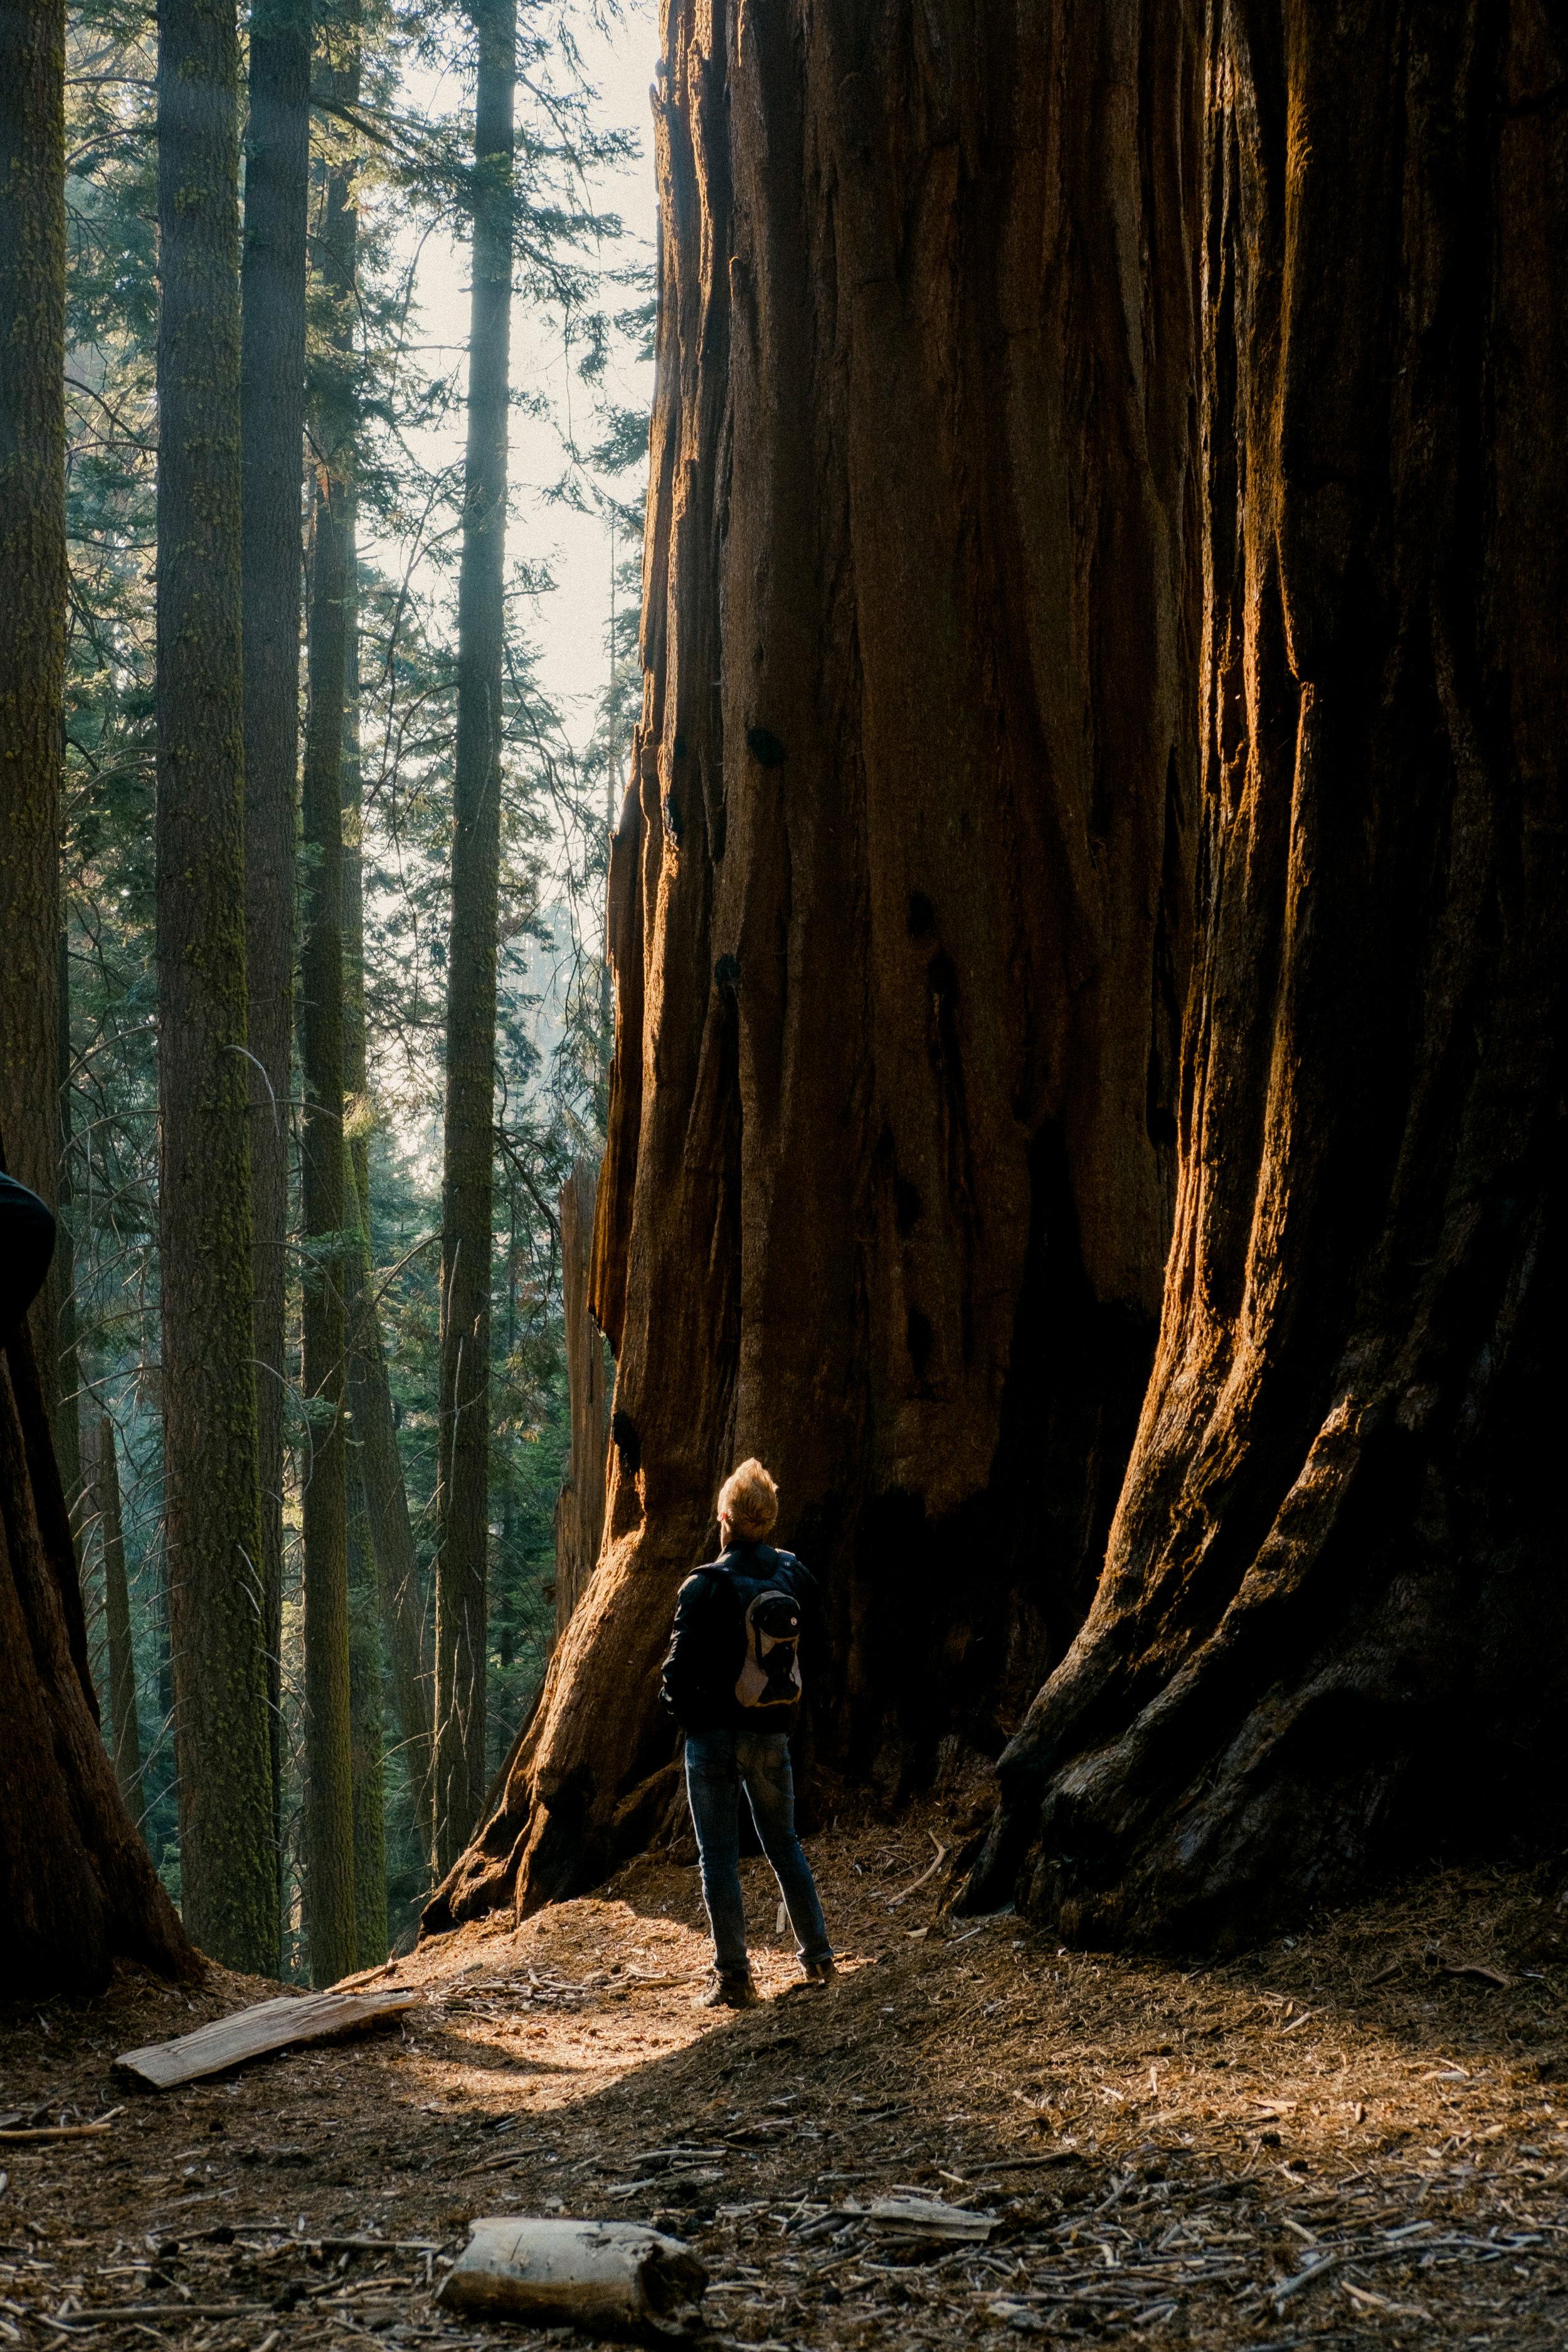 11-10-18 Sequoia-104.jpg